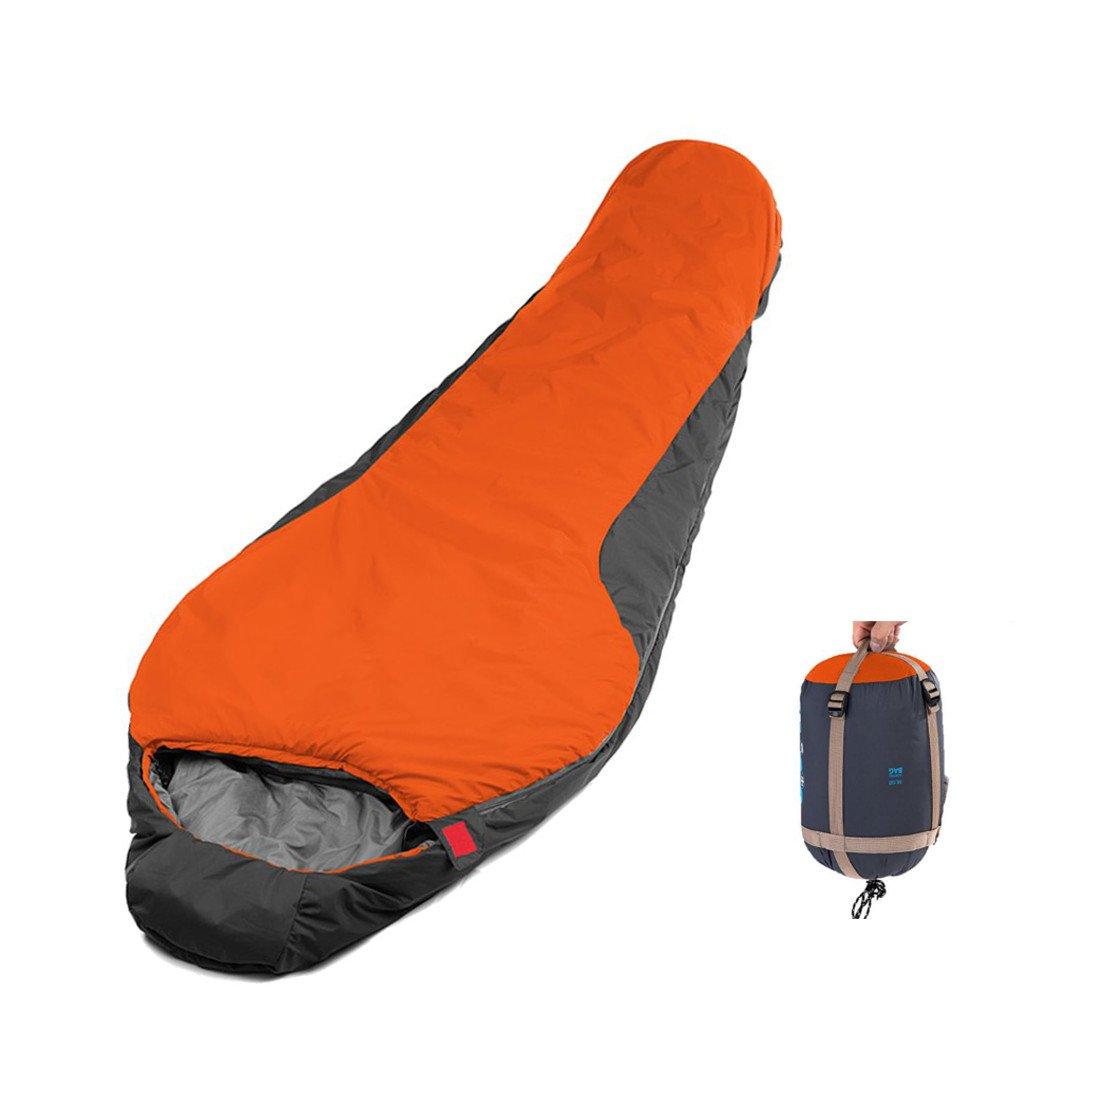 Outdoor Schlafsack Test, Schlafsack Test, Schlafsack, outdoor schlafsack, camping schlafsack, zelt schlafsack, schlafsack kaufen, schlafsack günstig